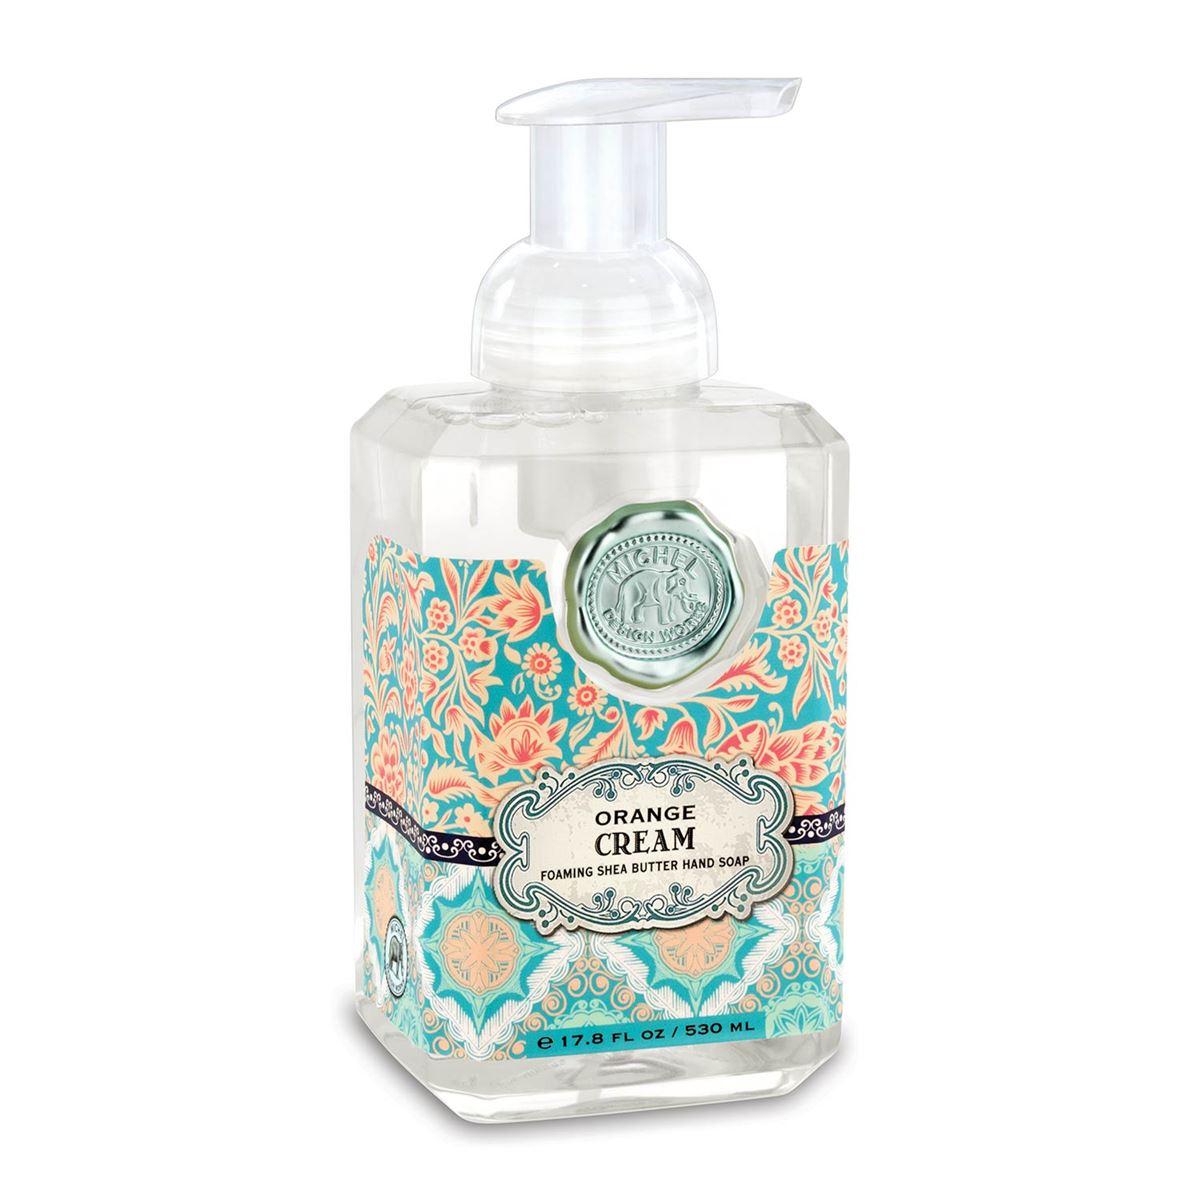 Foaming Hand Soap By Michel Design Works Orange Cream